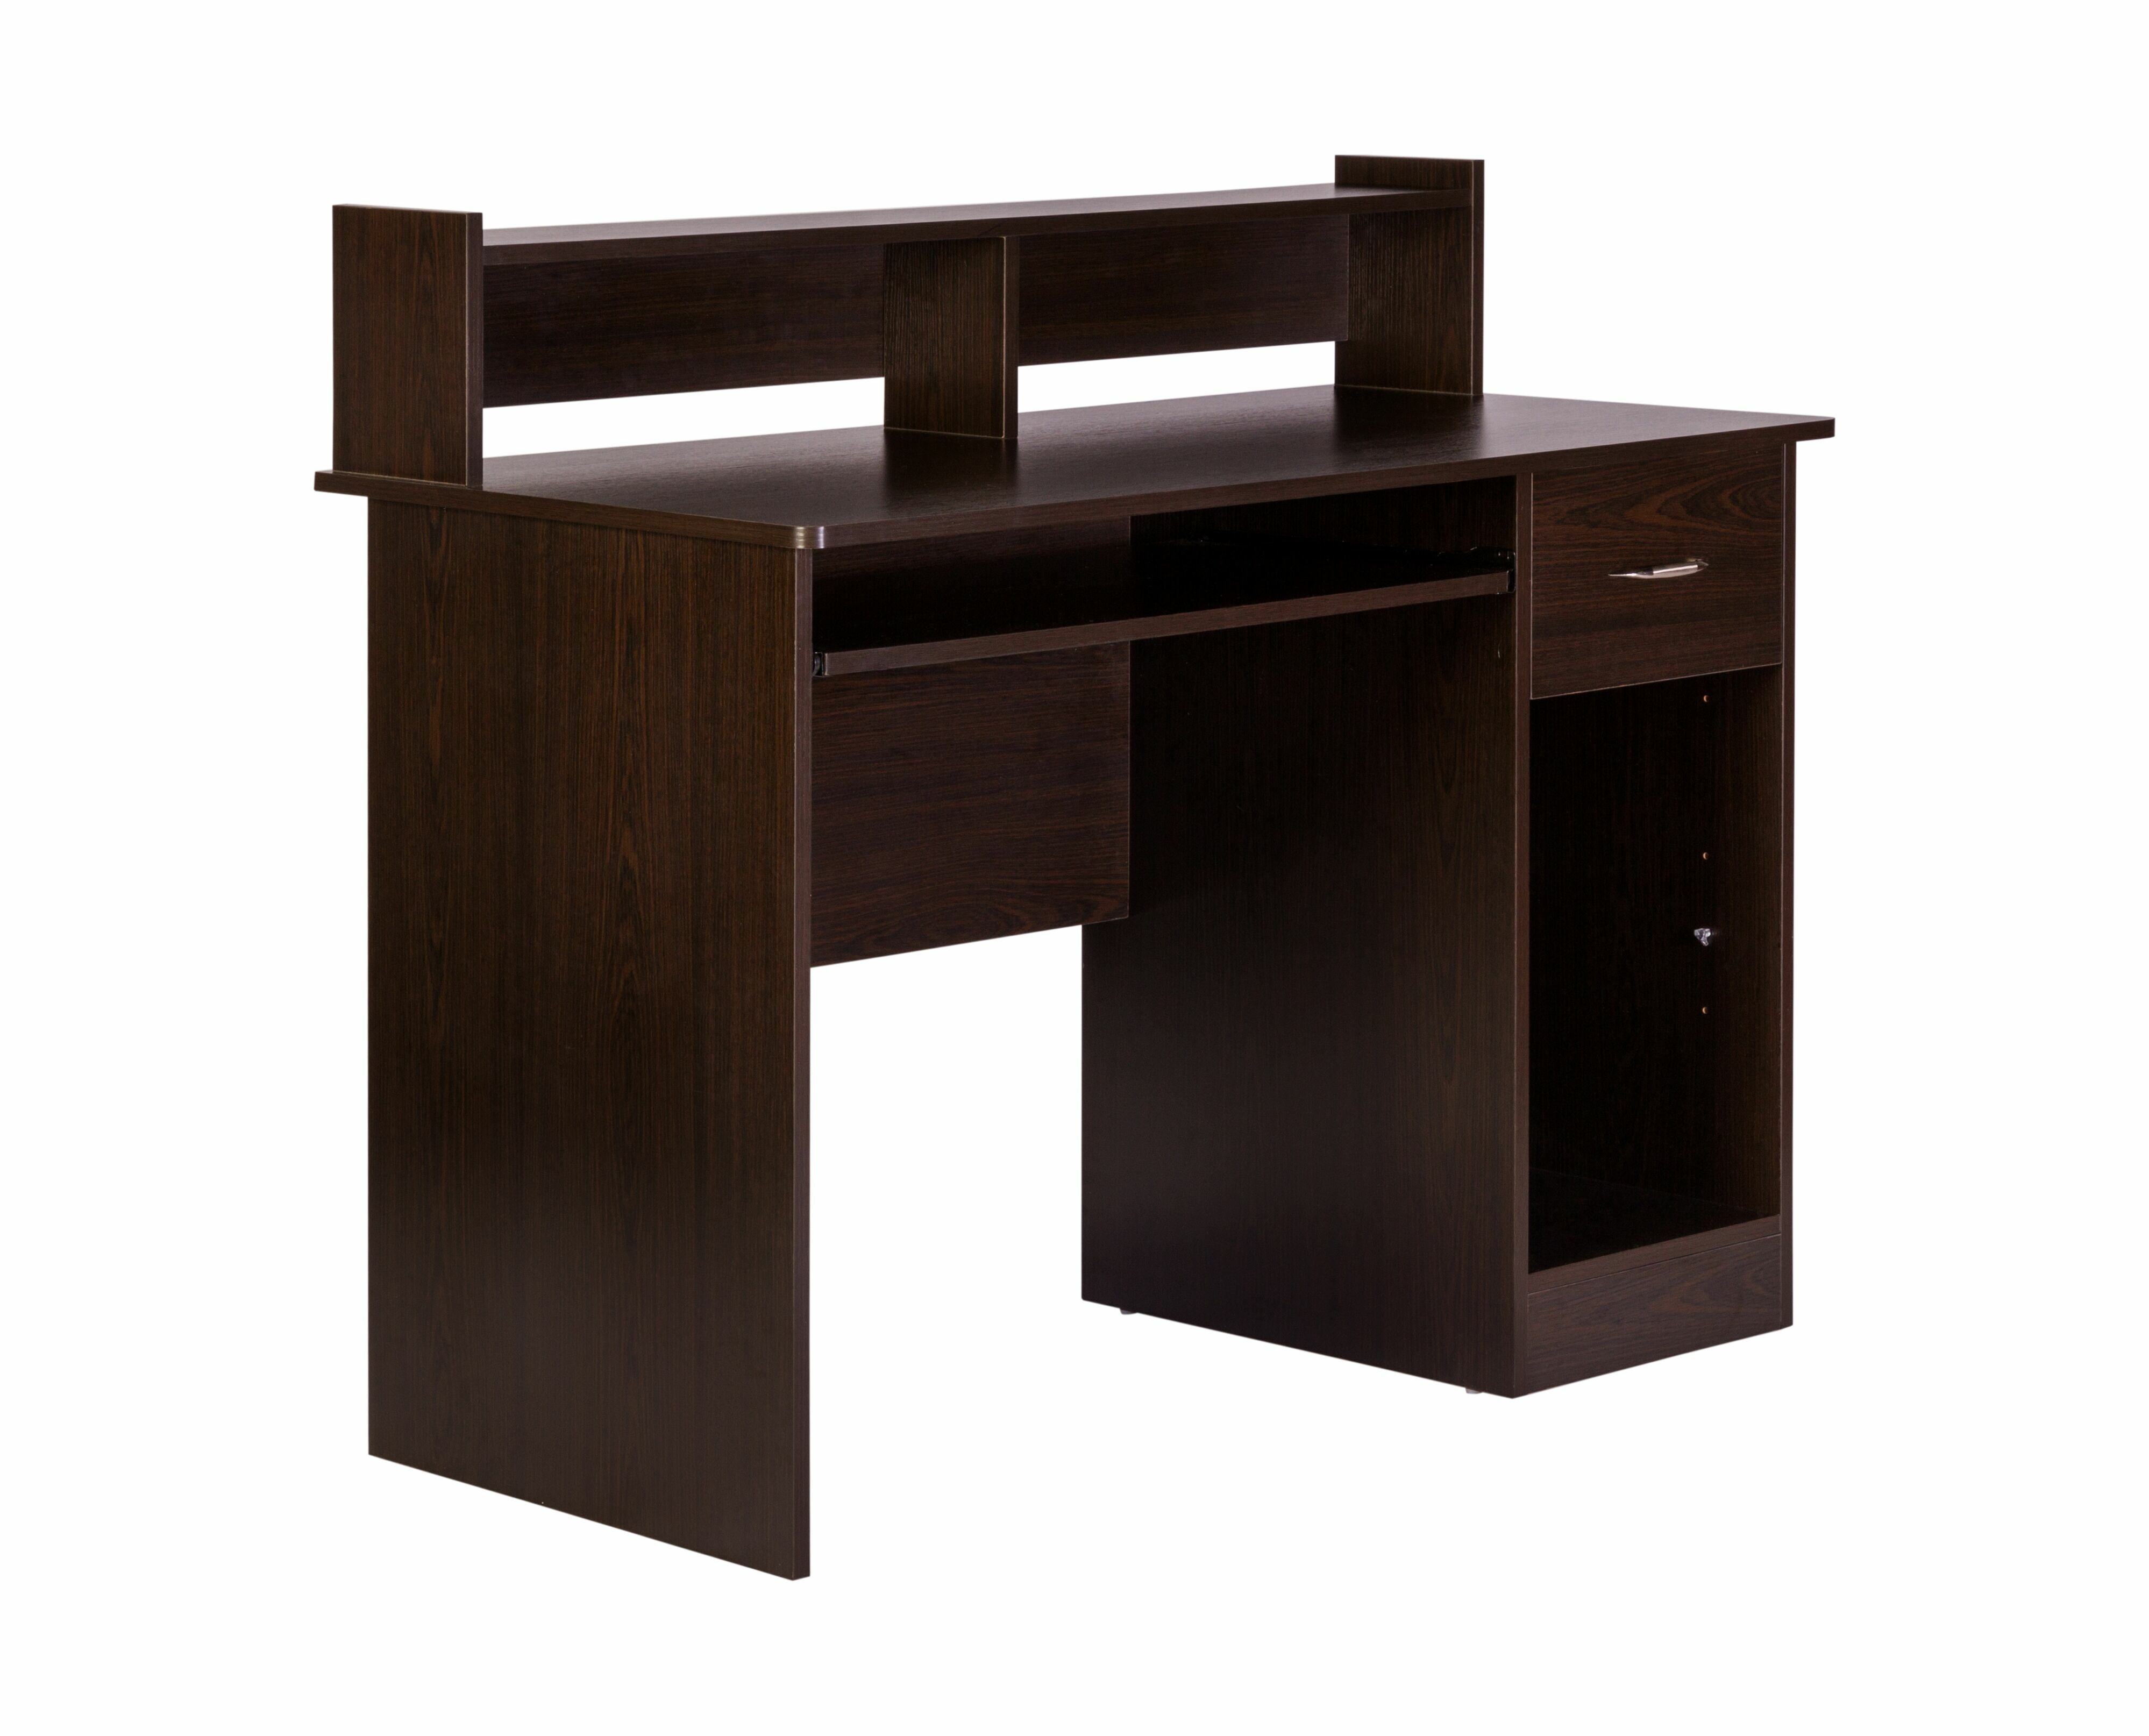 Student Computer Desk Wood Table Hutch Keyboard Sliding Tray Drawer Shelf School